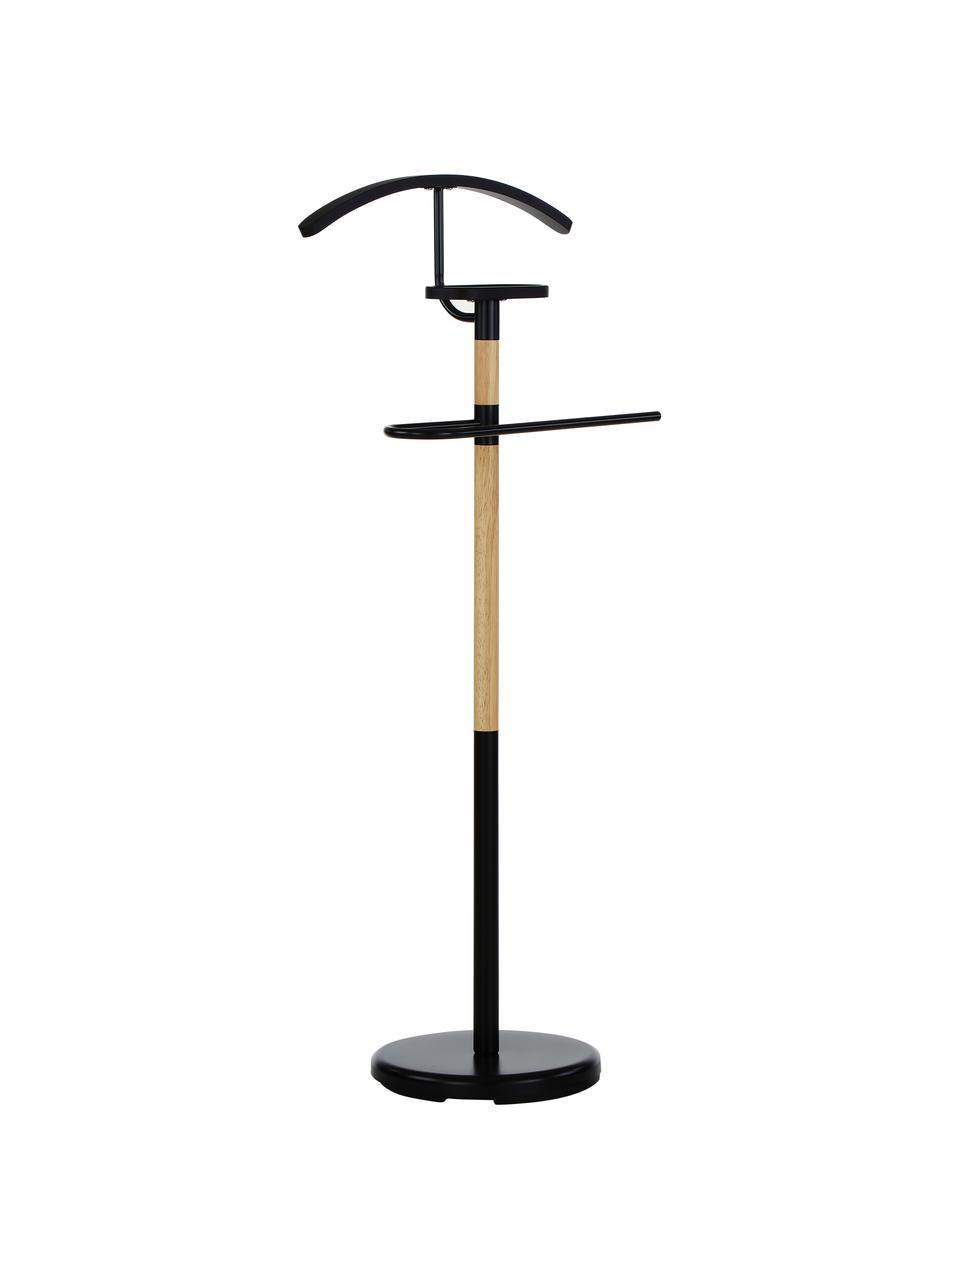 Dressboy Esteban, Staal, rubberhout, Zwart, bruin, H 114 cm